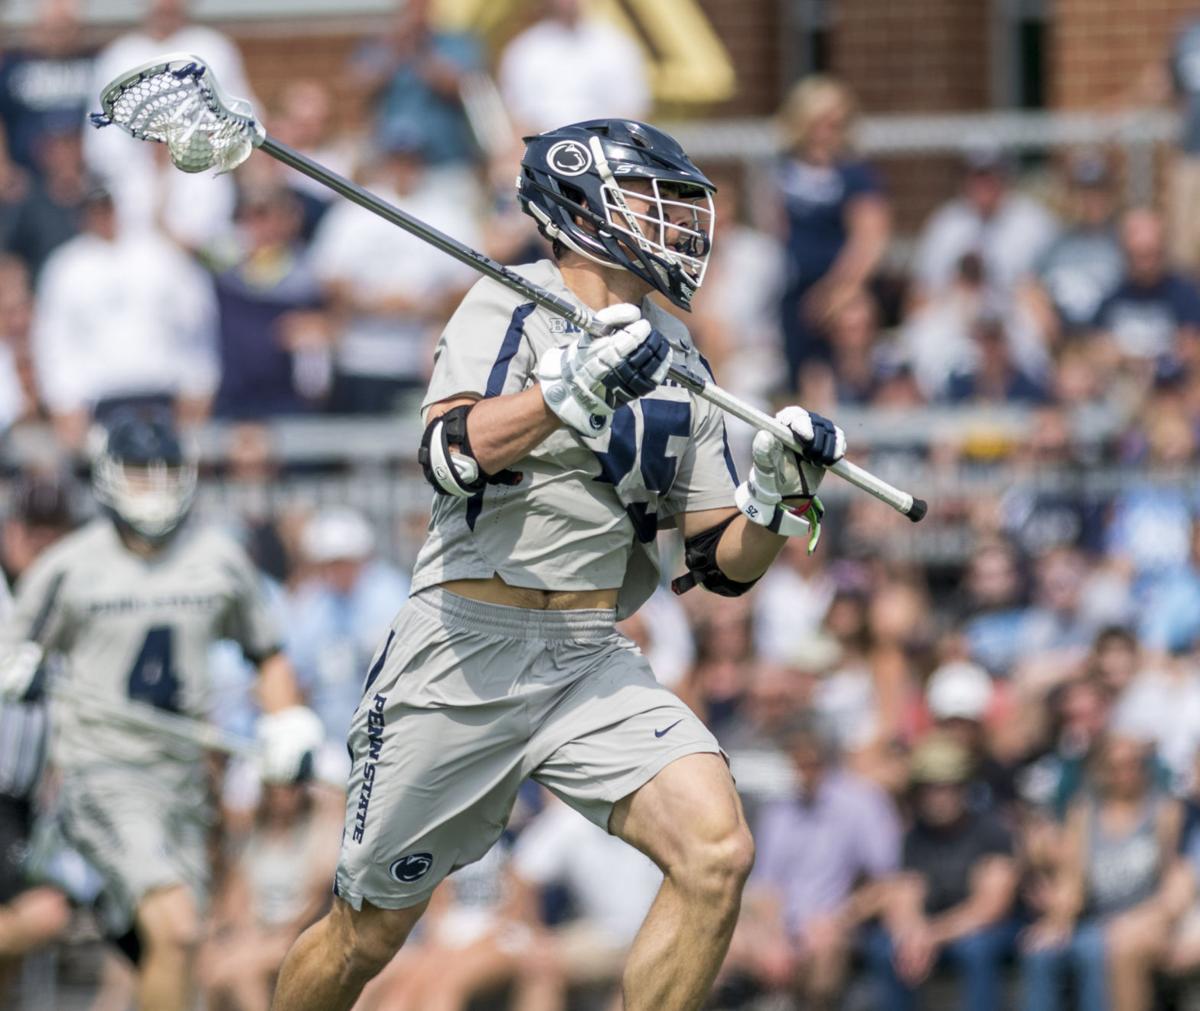 No. 14 Penn State men's lacrosse Sabia (25) upsets No. 5 Johns Hopkins